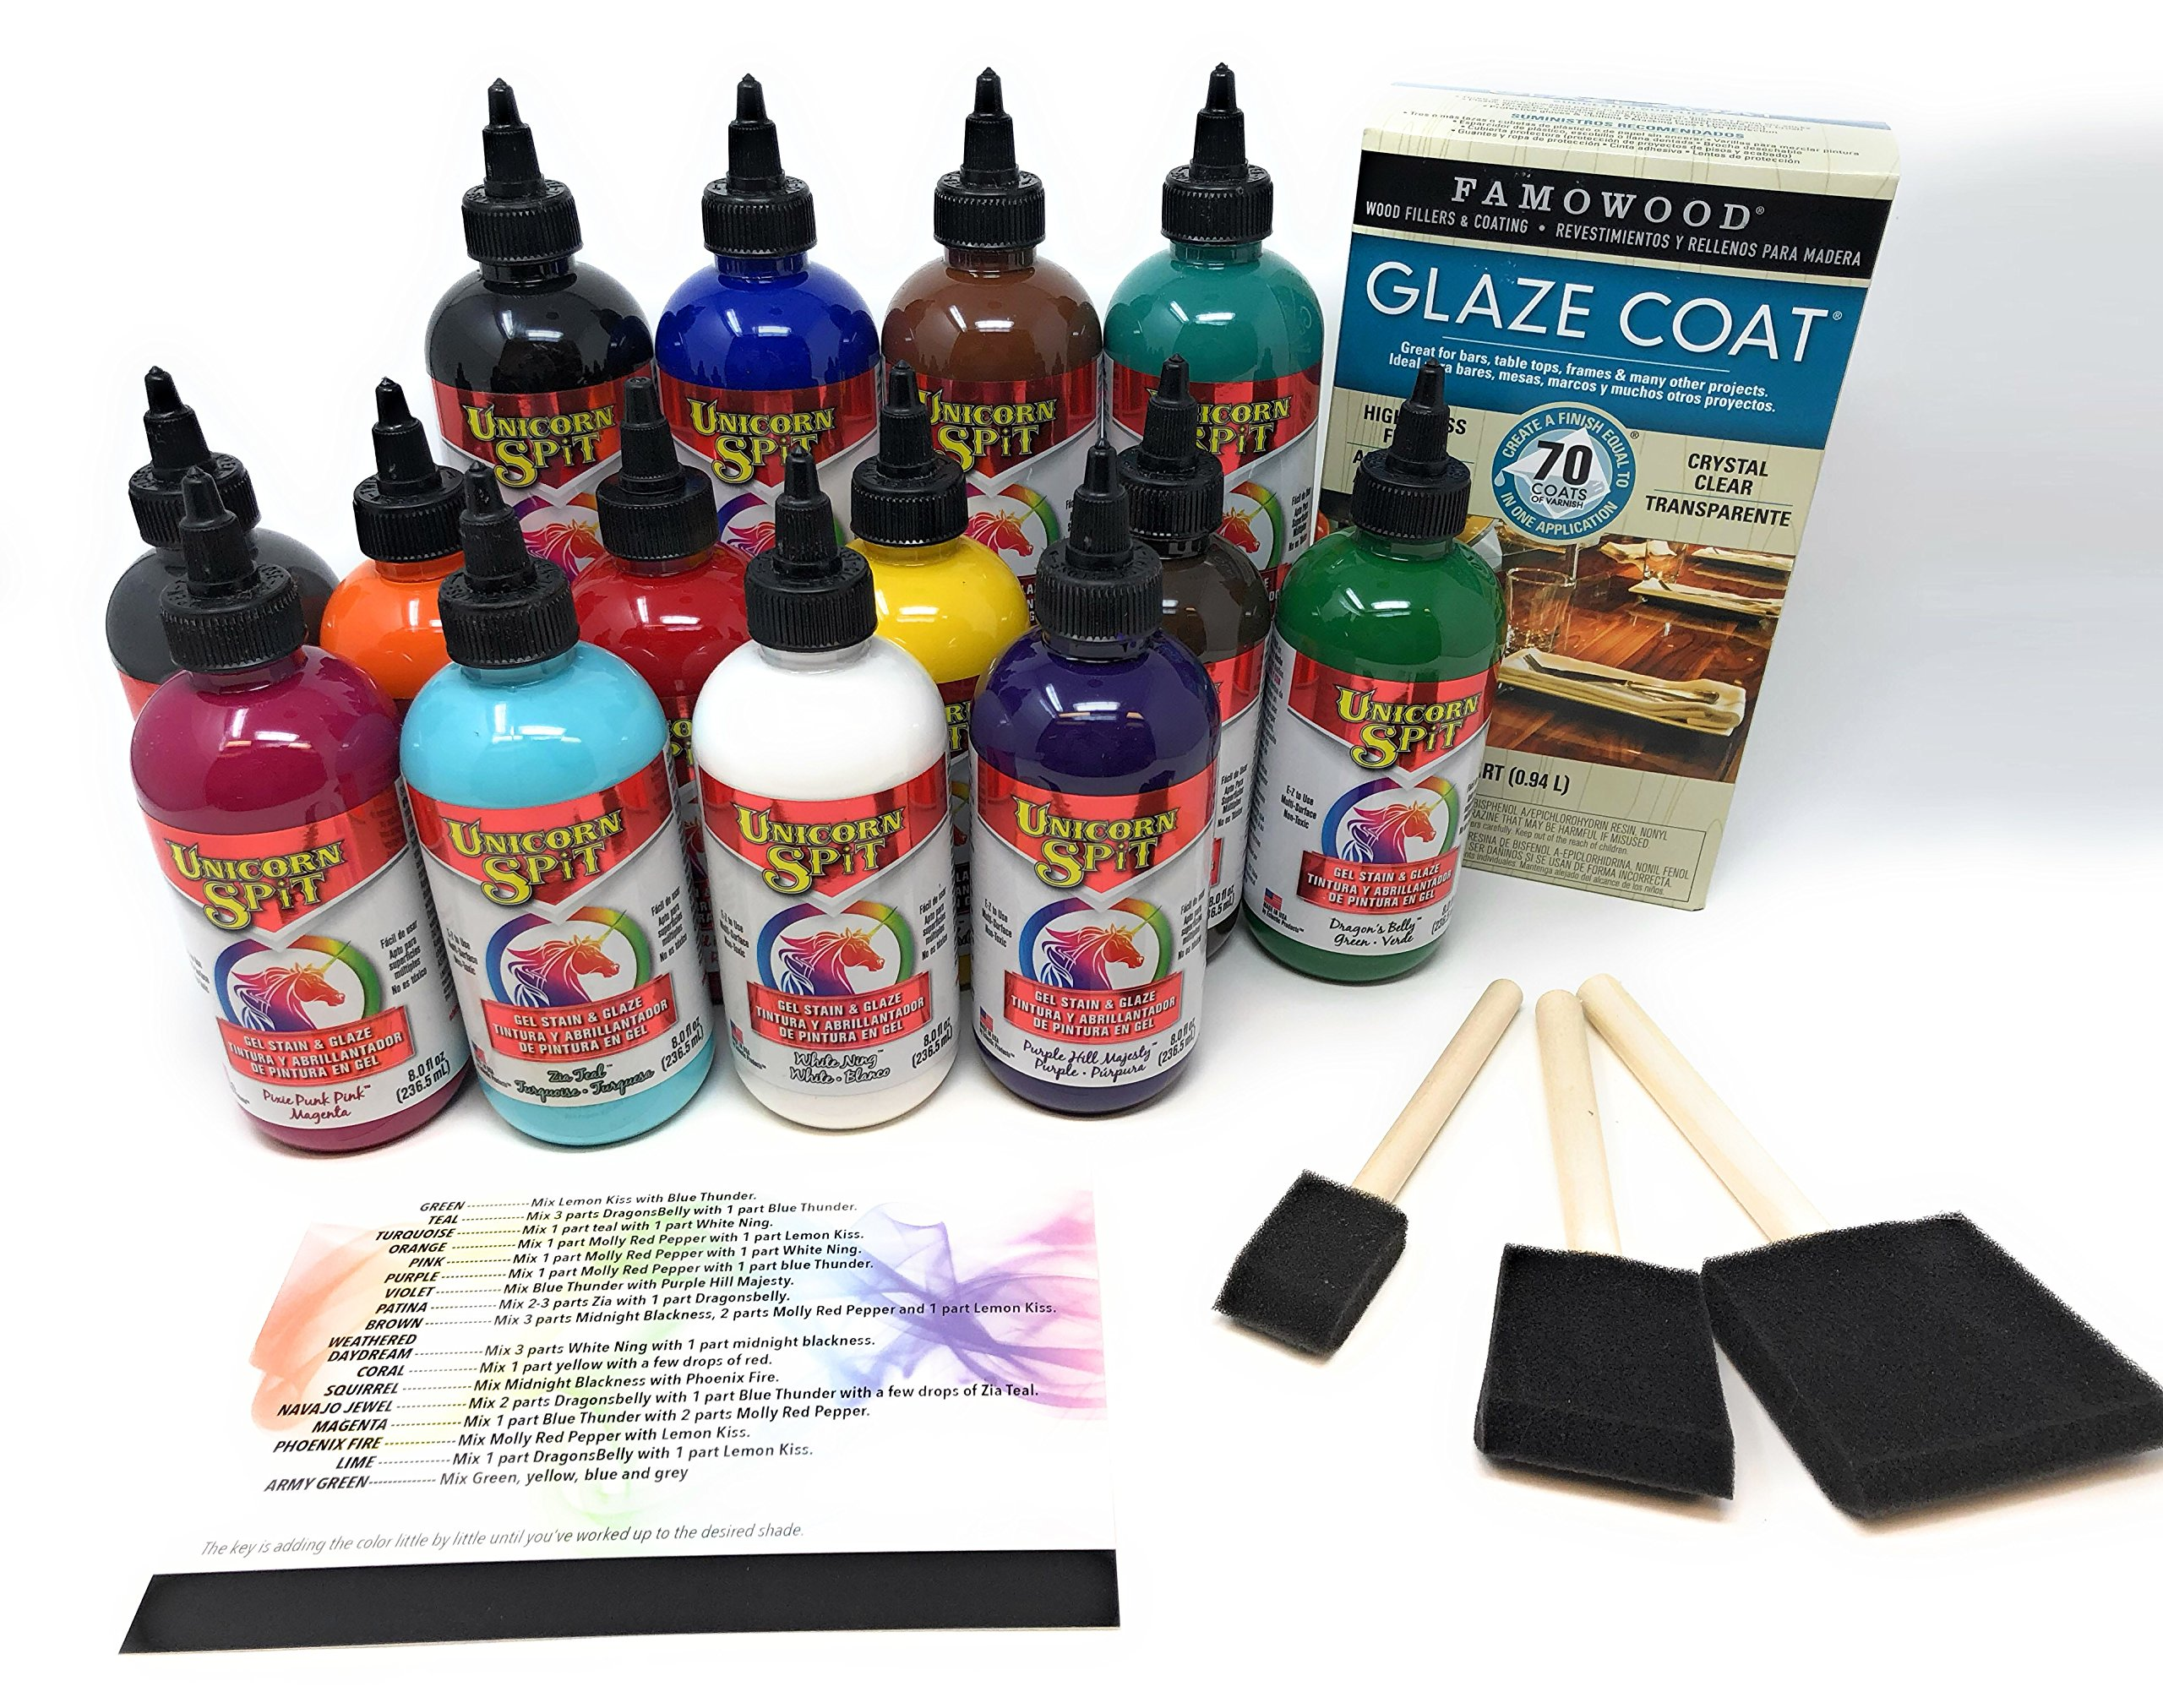 Unicorn SPiT Bundle - All 14 Colors (8oz Bottles), 1 Quart Famowood Glaze, 3 Foam Brushes, Reference Card